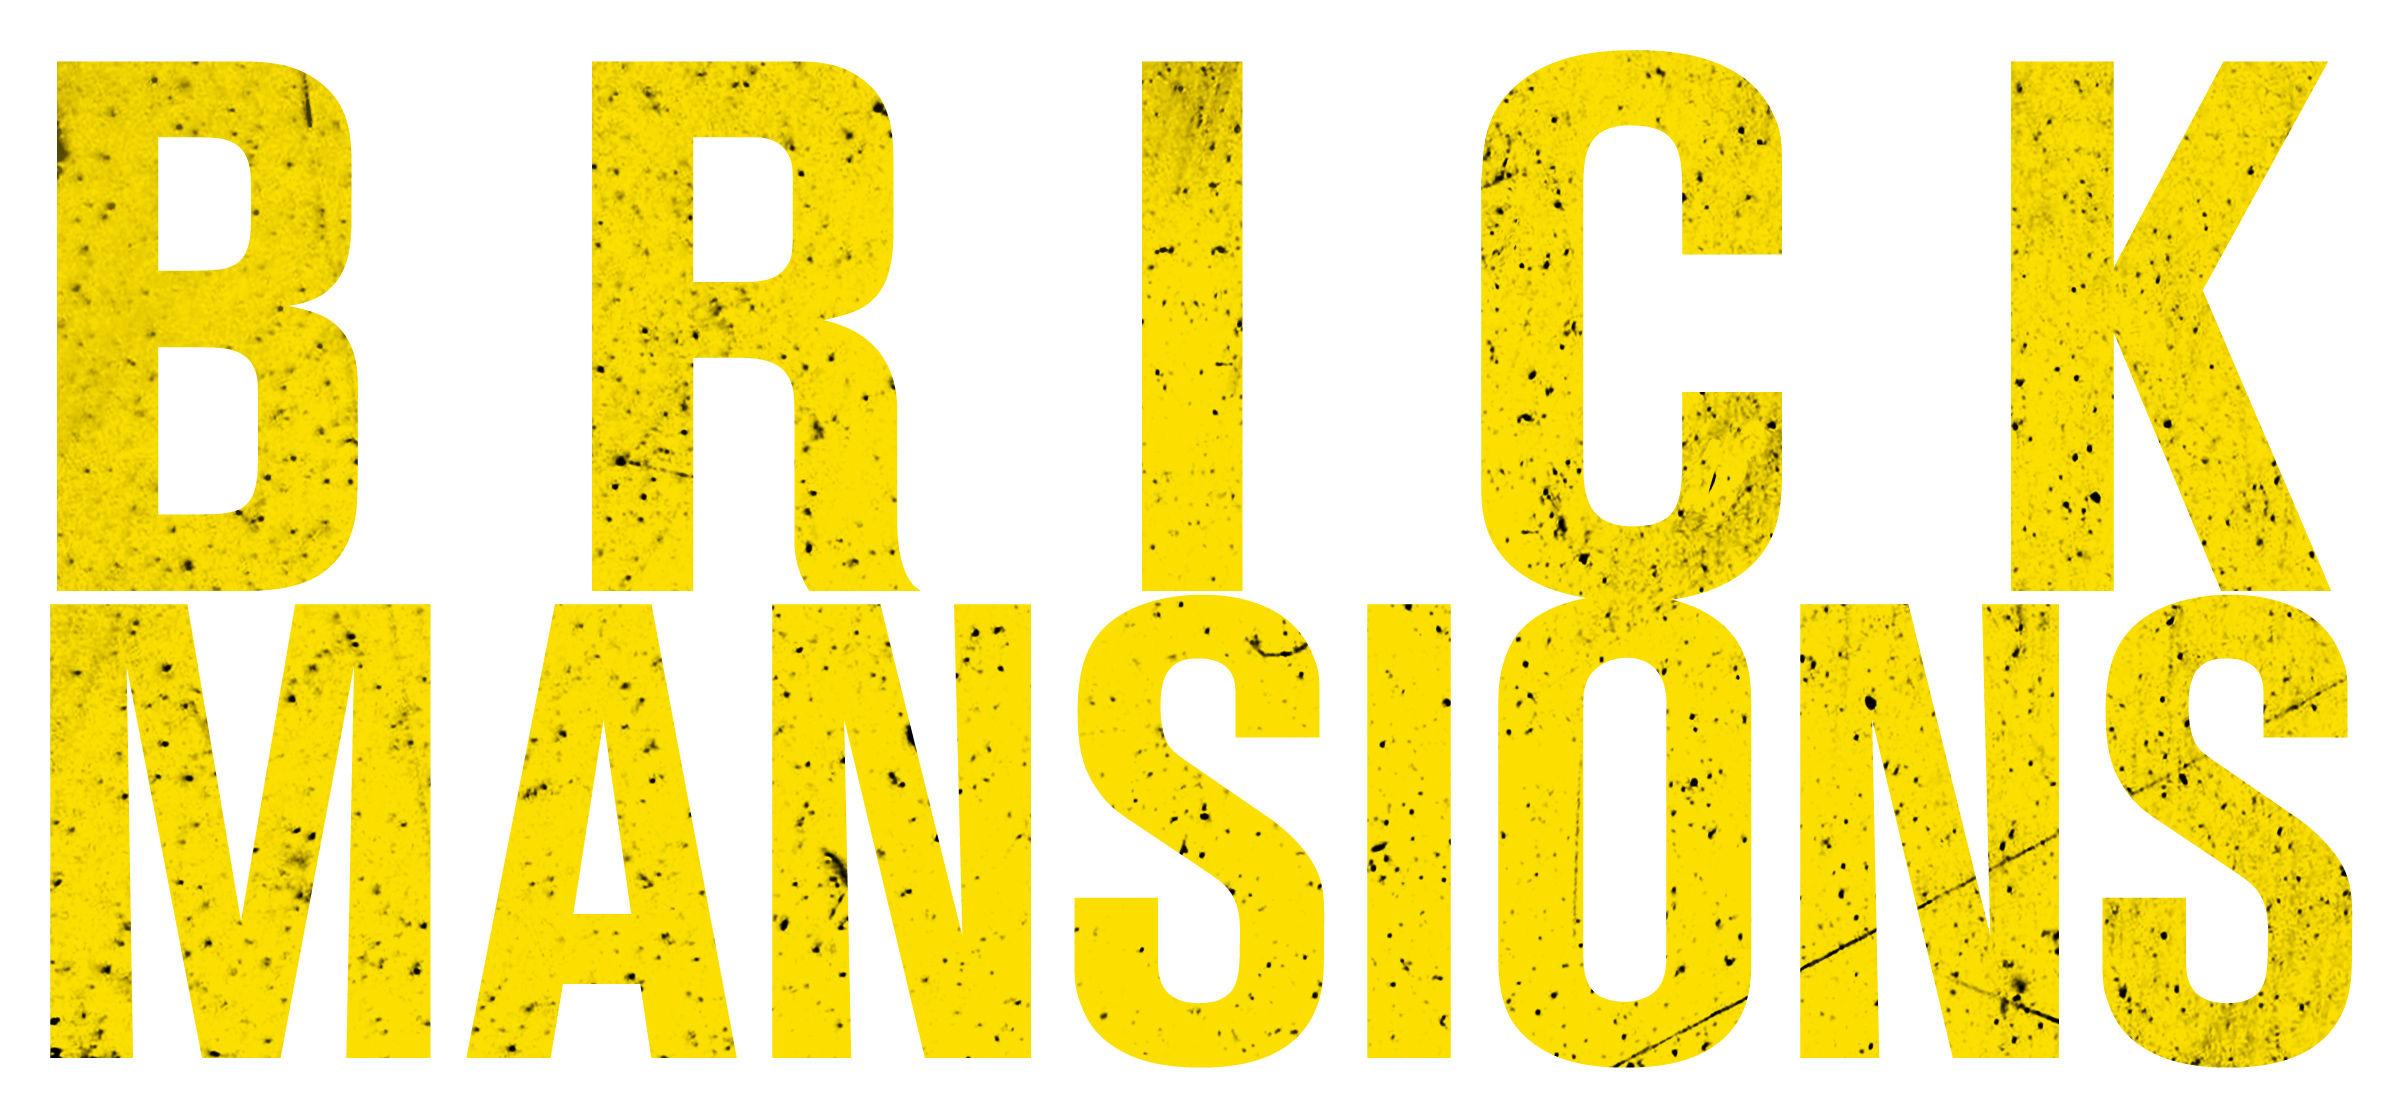 Brick_Mansions_Titelschriftzug_01.300dpi